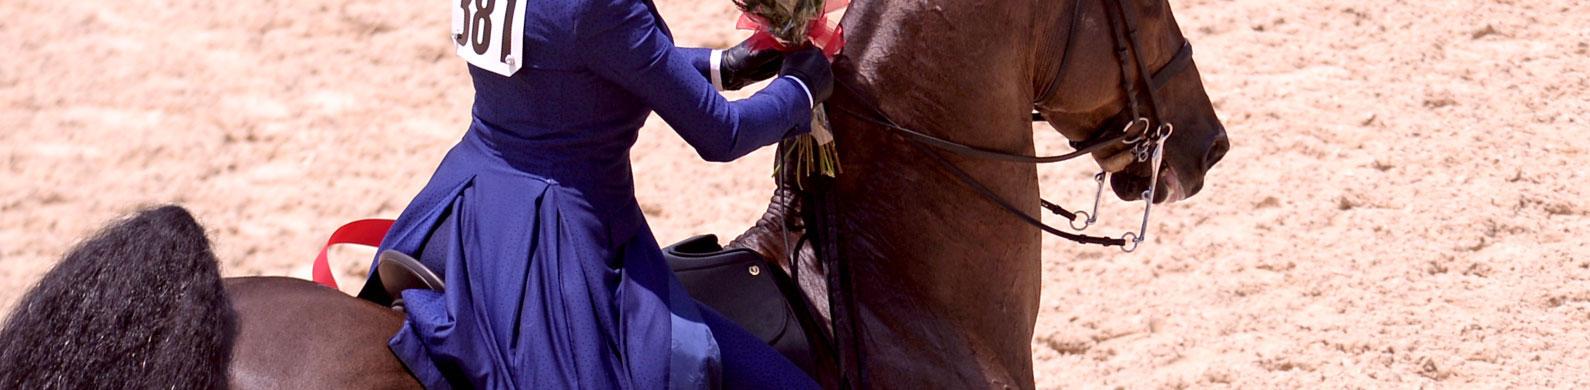 Saddle Seat Us Equestrian